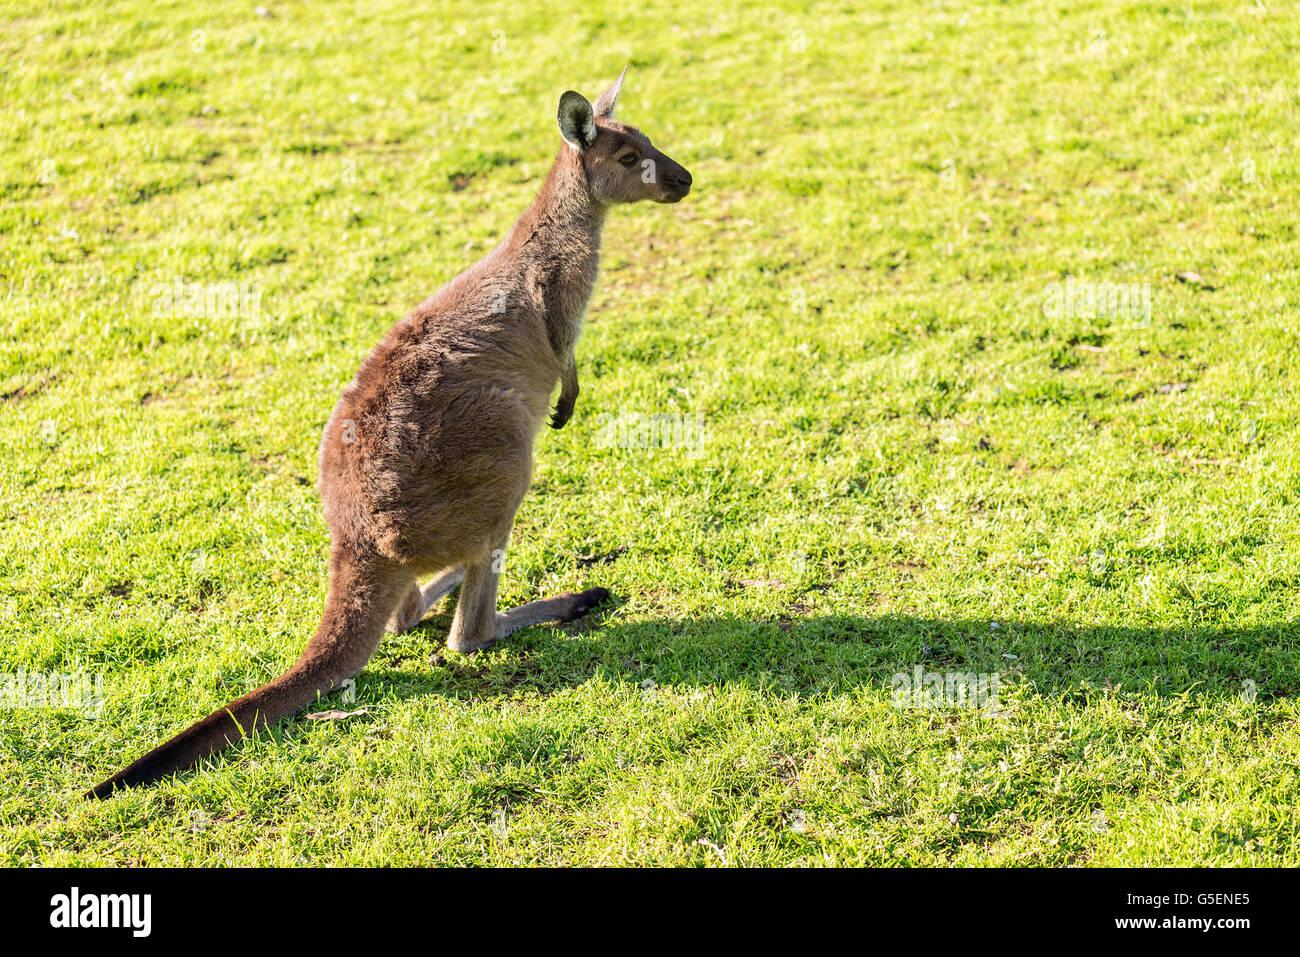 Australian kangaroo sitting on the ground at sunset - Stock Image